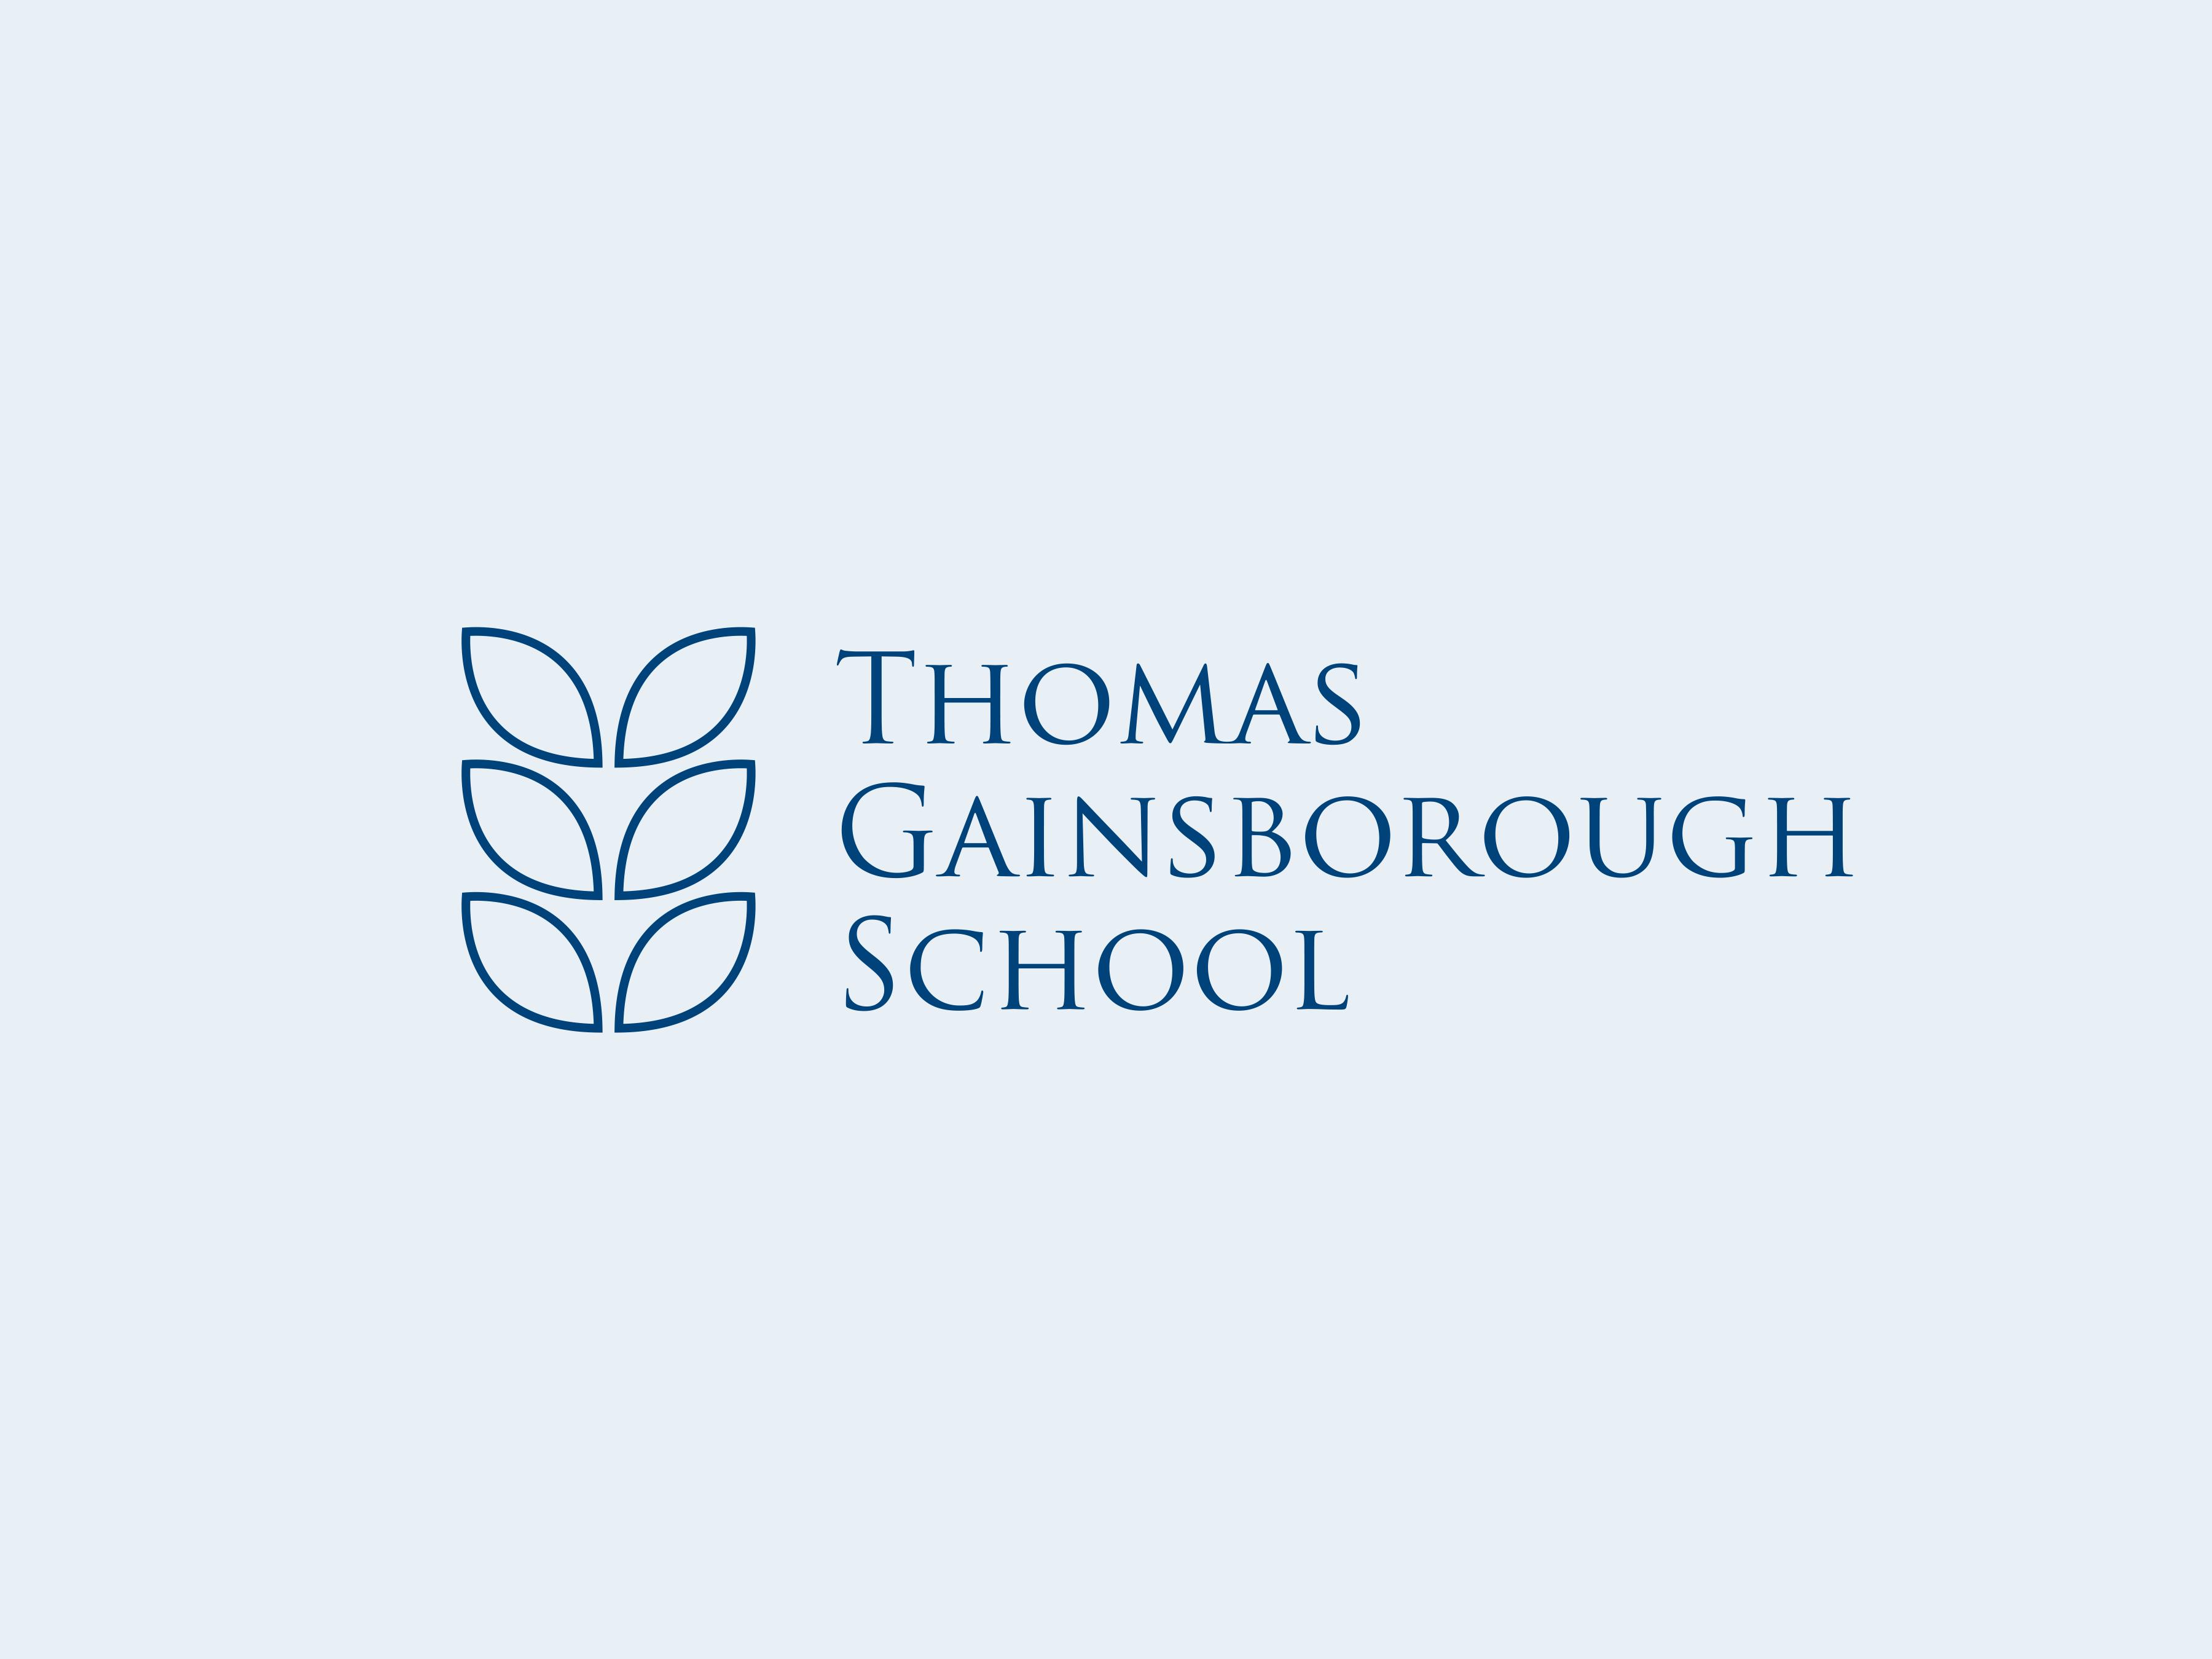 Thomas gainborough school logo